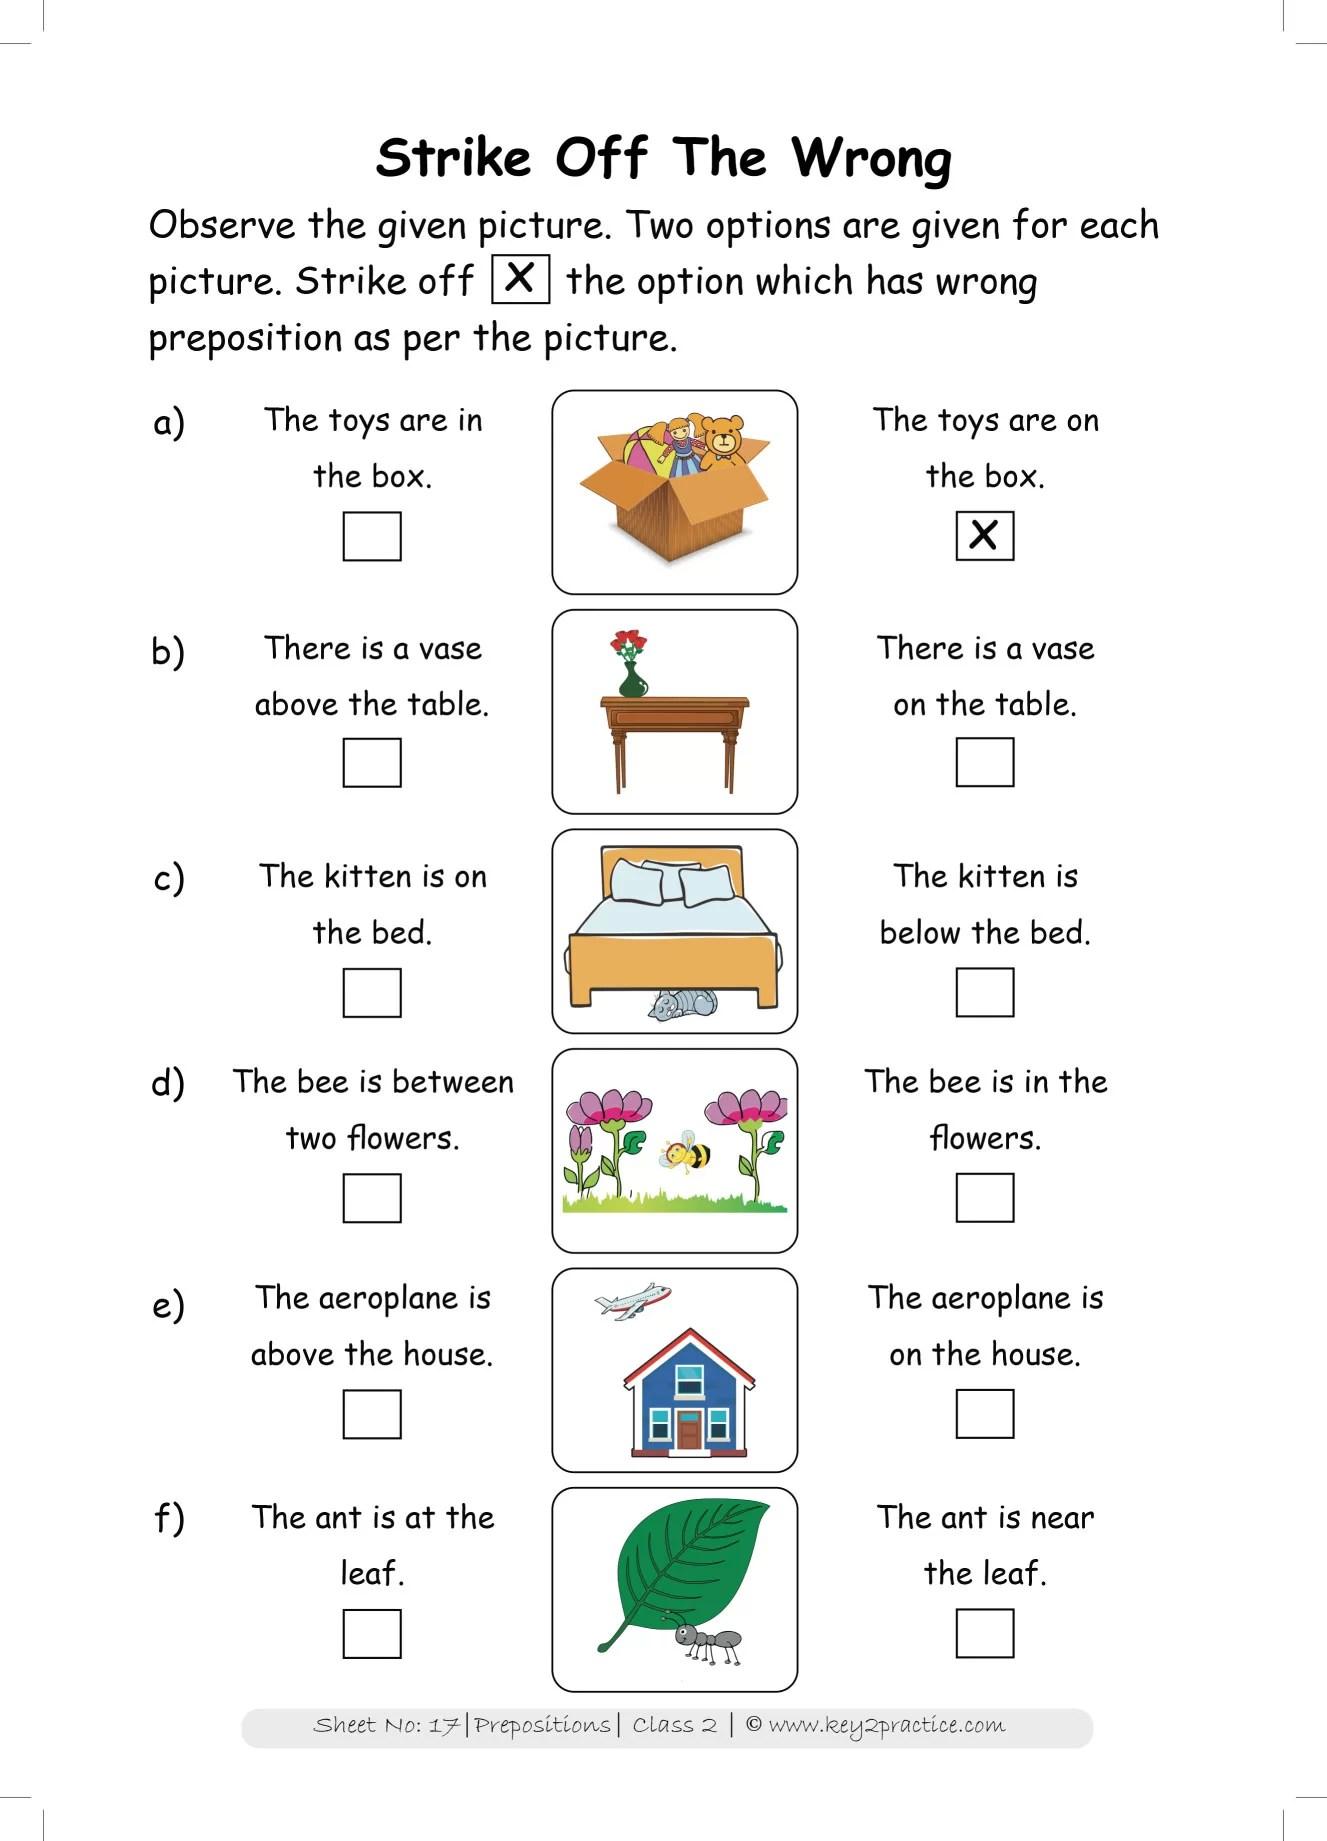 medium resolution of https://dubaikhalifas.com/grade-2-english-worksheets-prepositions-key2practice-workbooks/